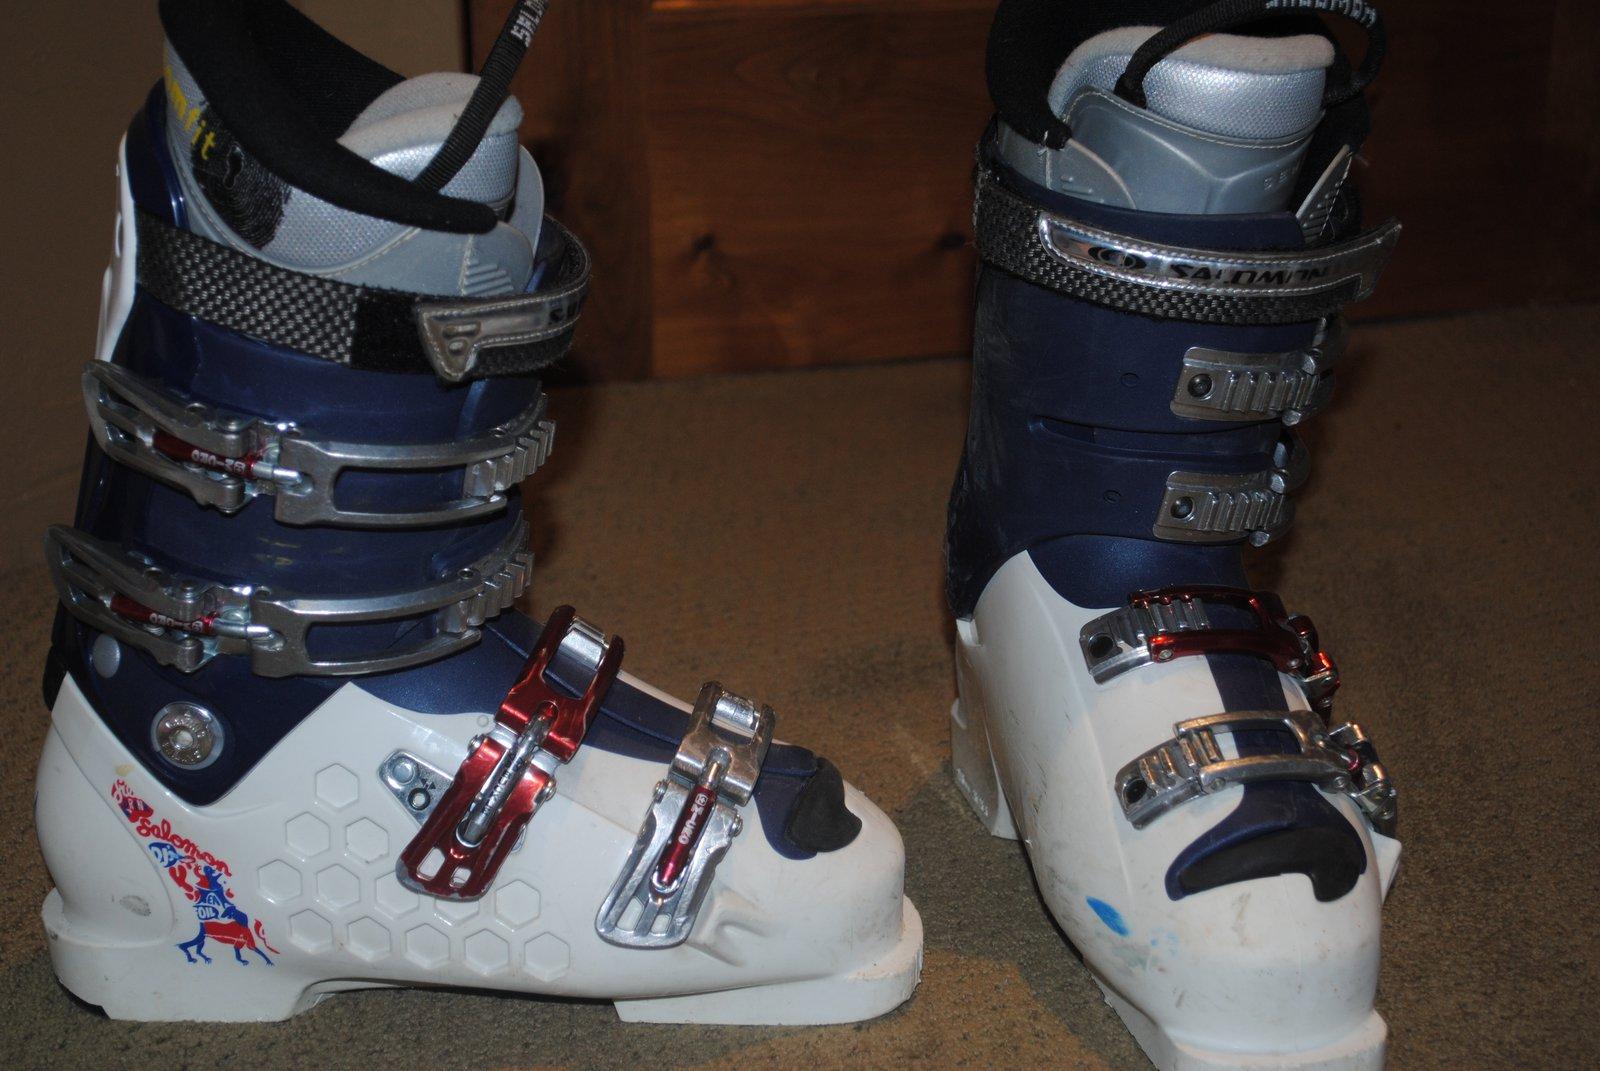 Boots 4 sale